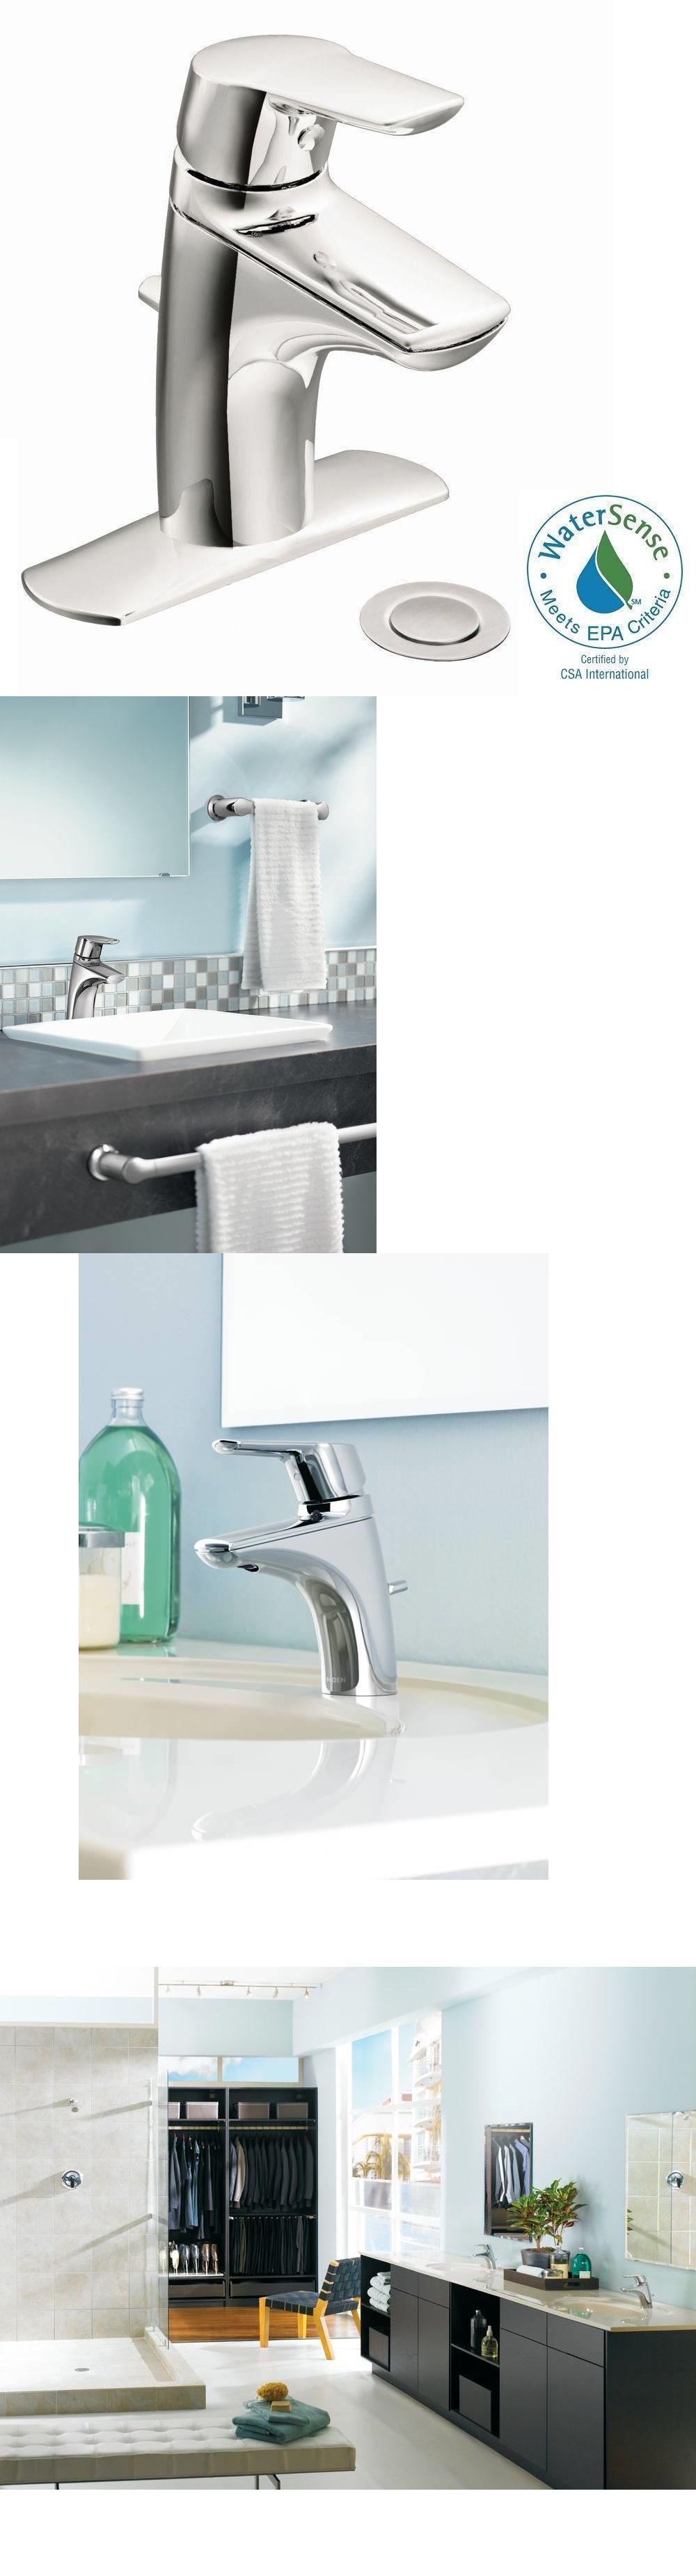 Faucets 42024 New Moen 6810 Single Handle Centerset Low Arc